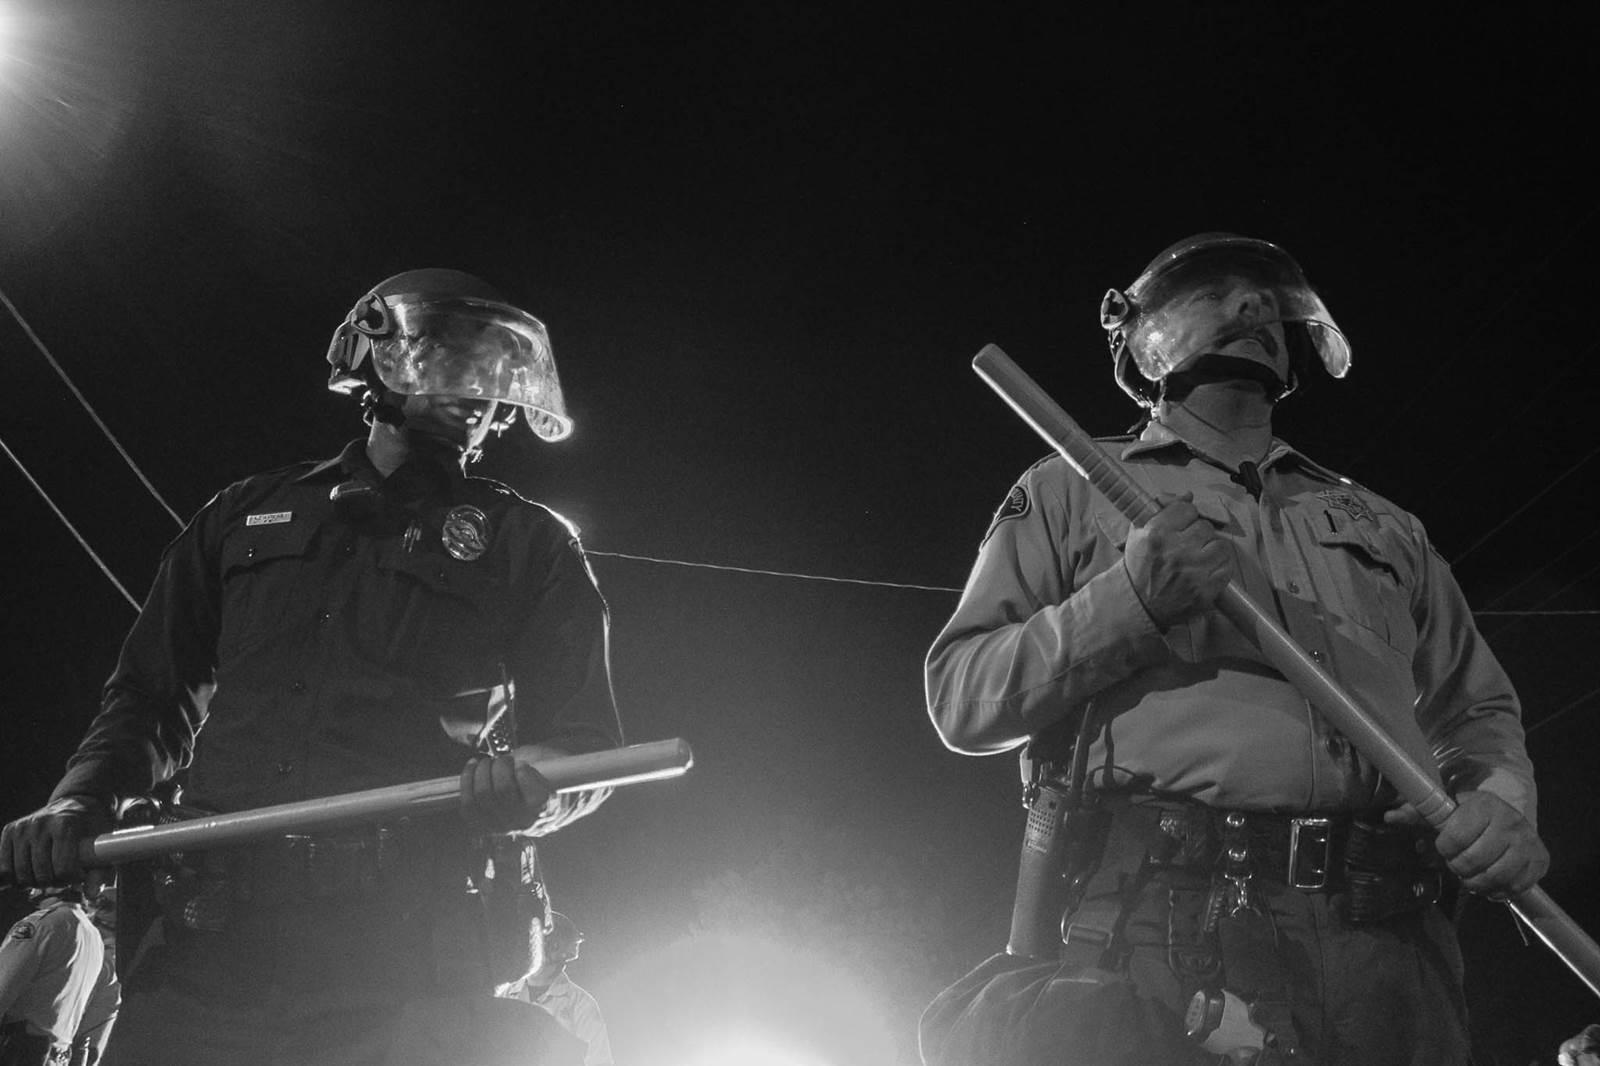 El Cajon Police Department prepared for protests in riot gear.